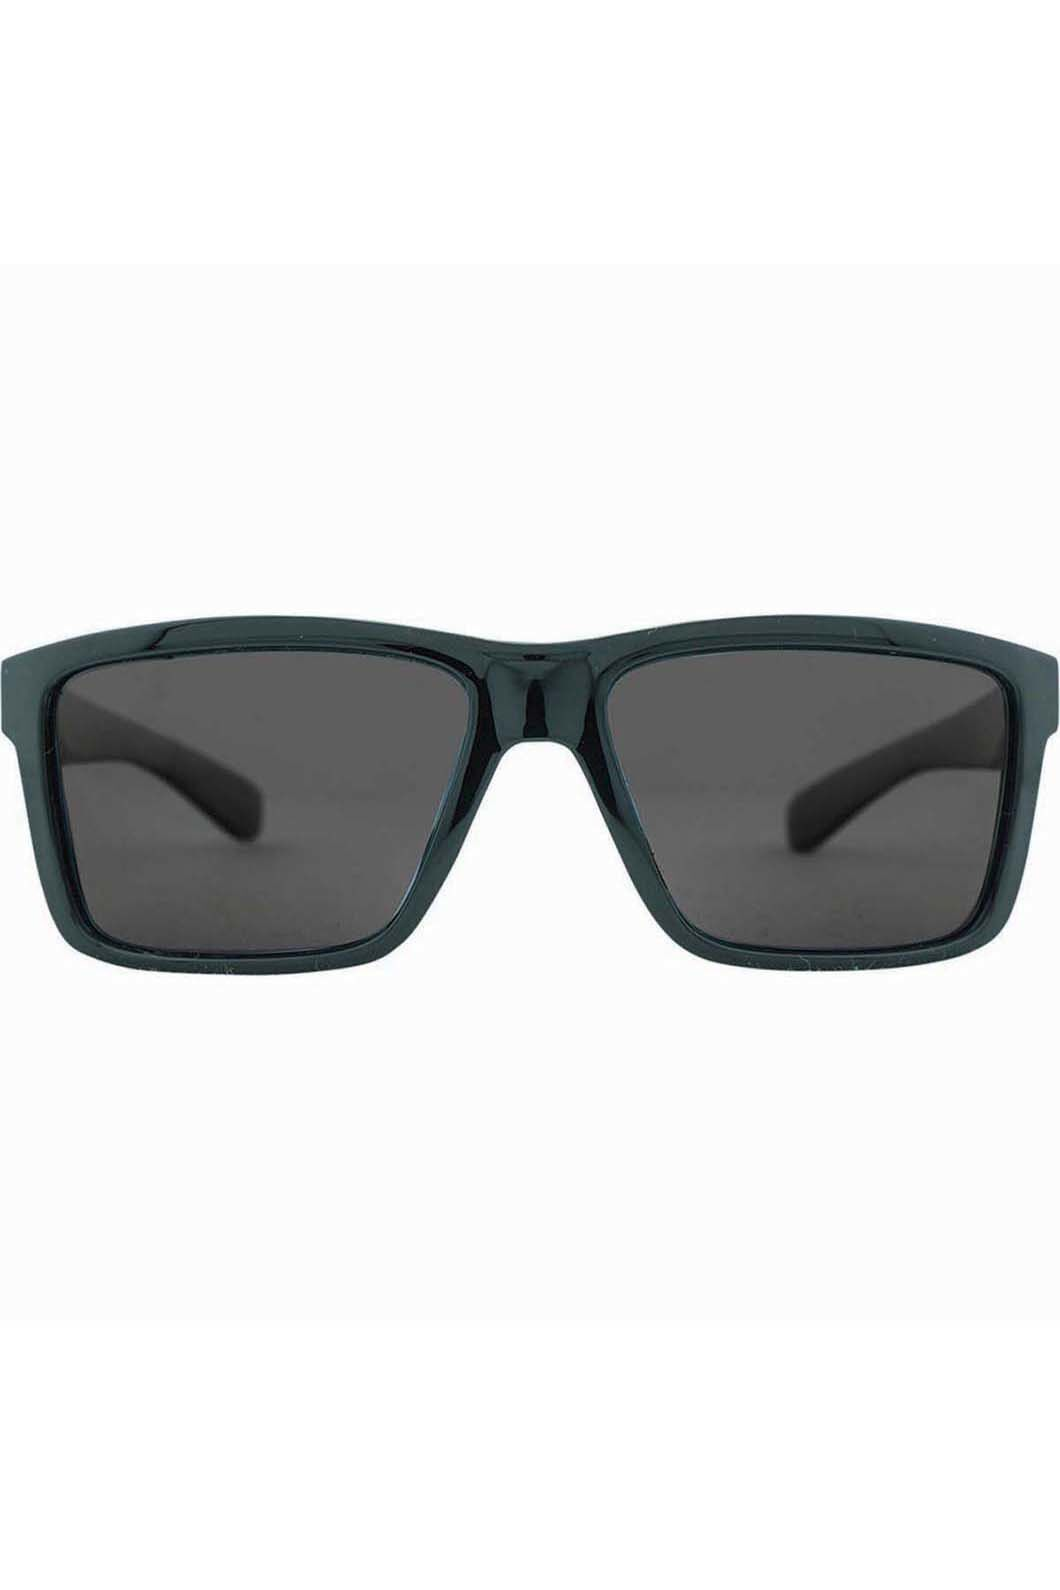 Venture Eyewear Men's Climb Sunglasses, Black/Grey, hi-res